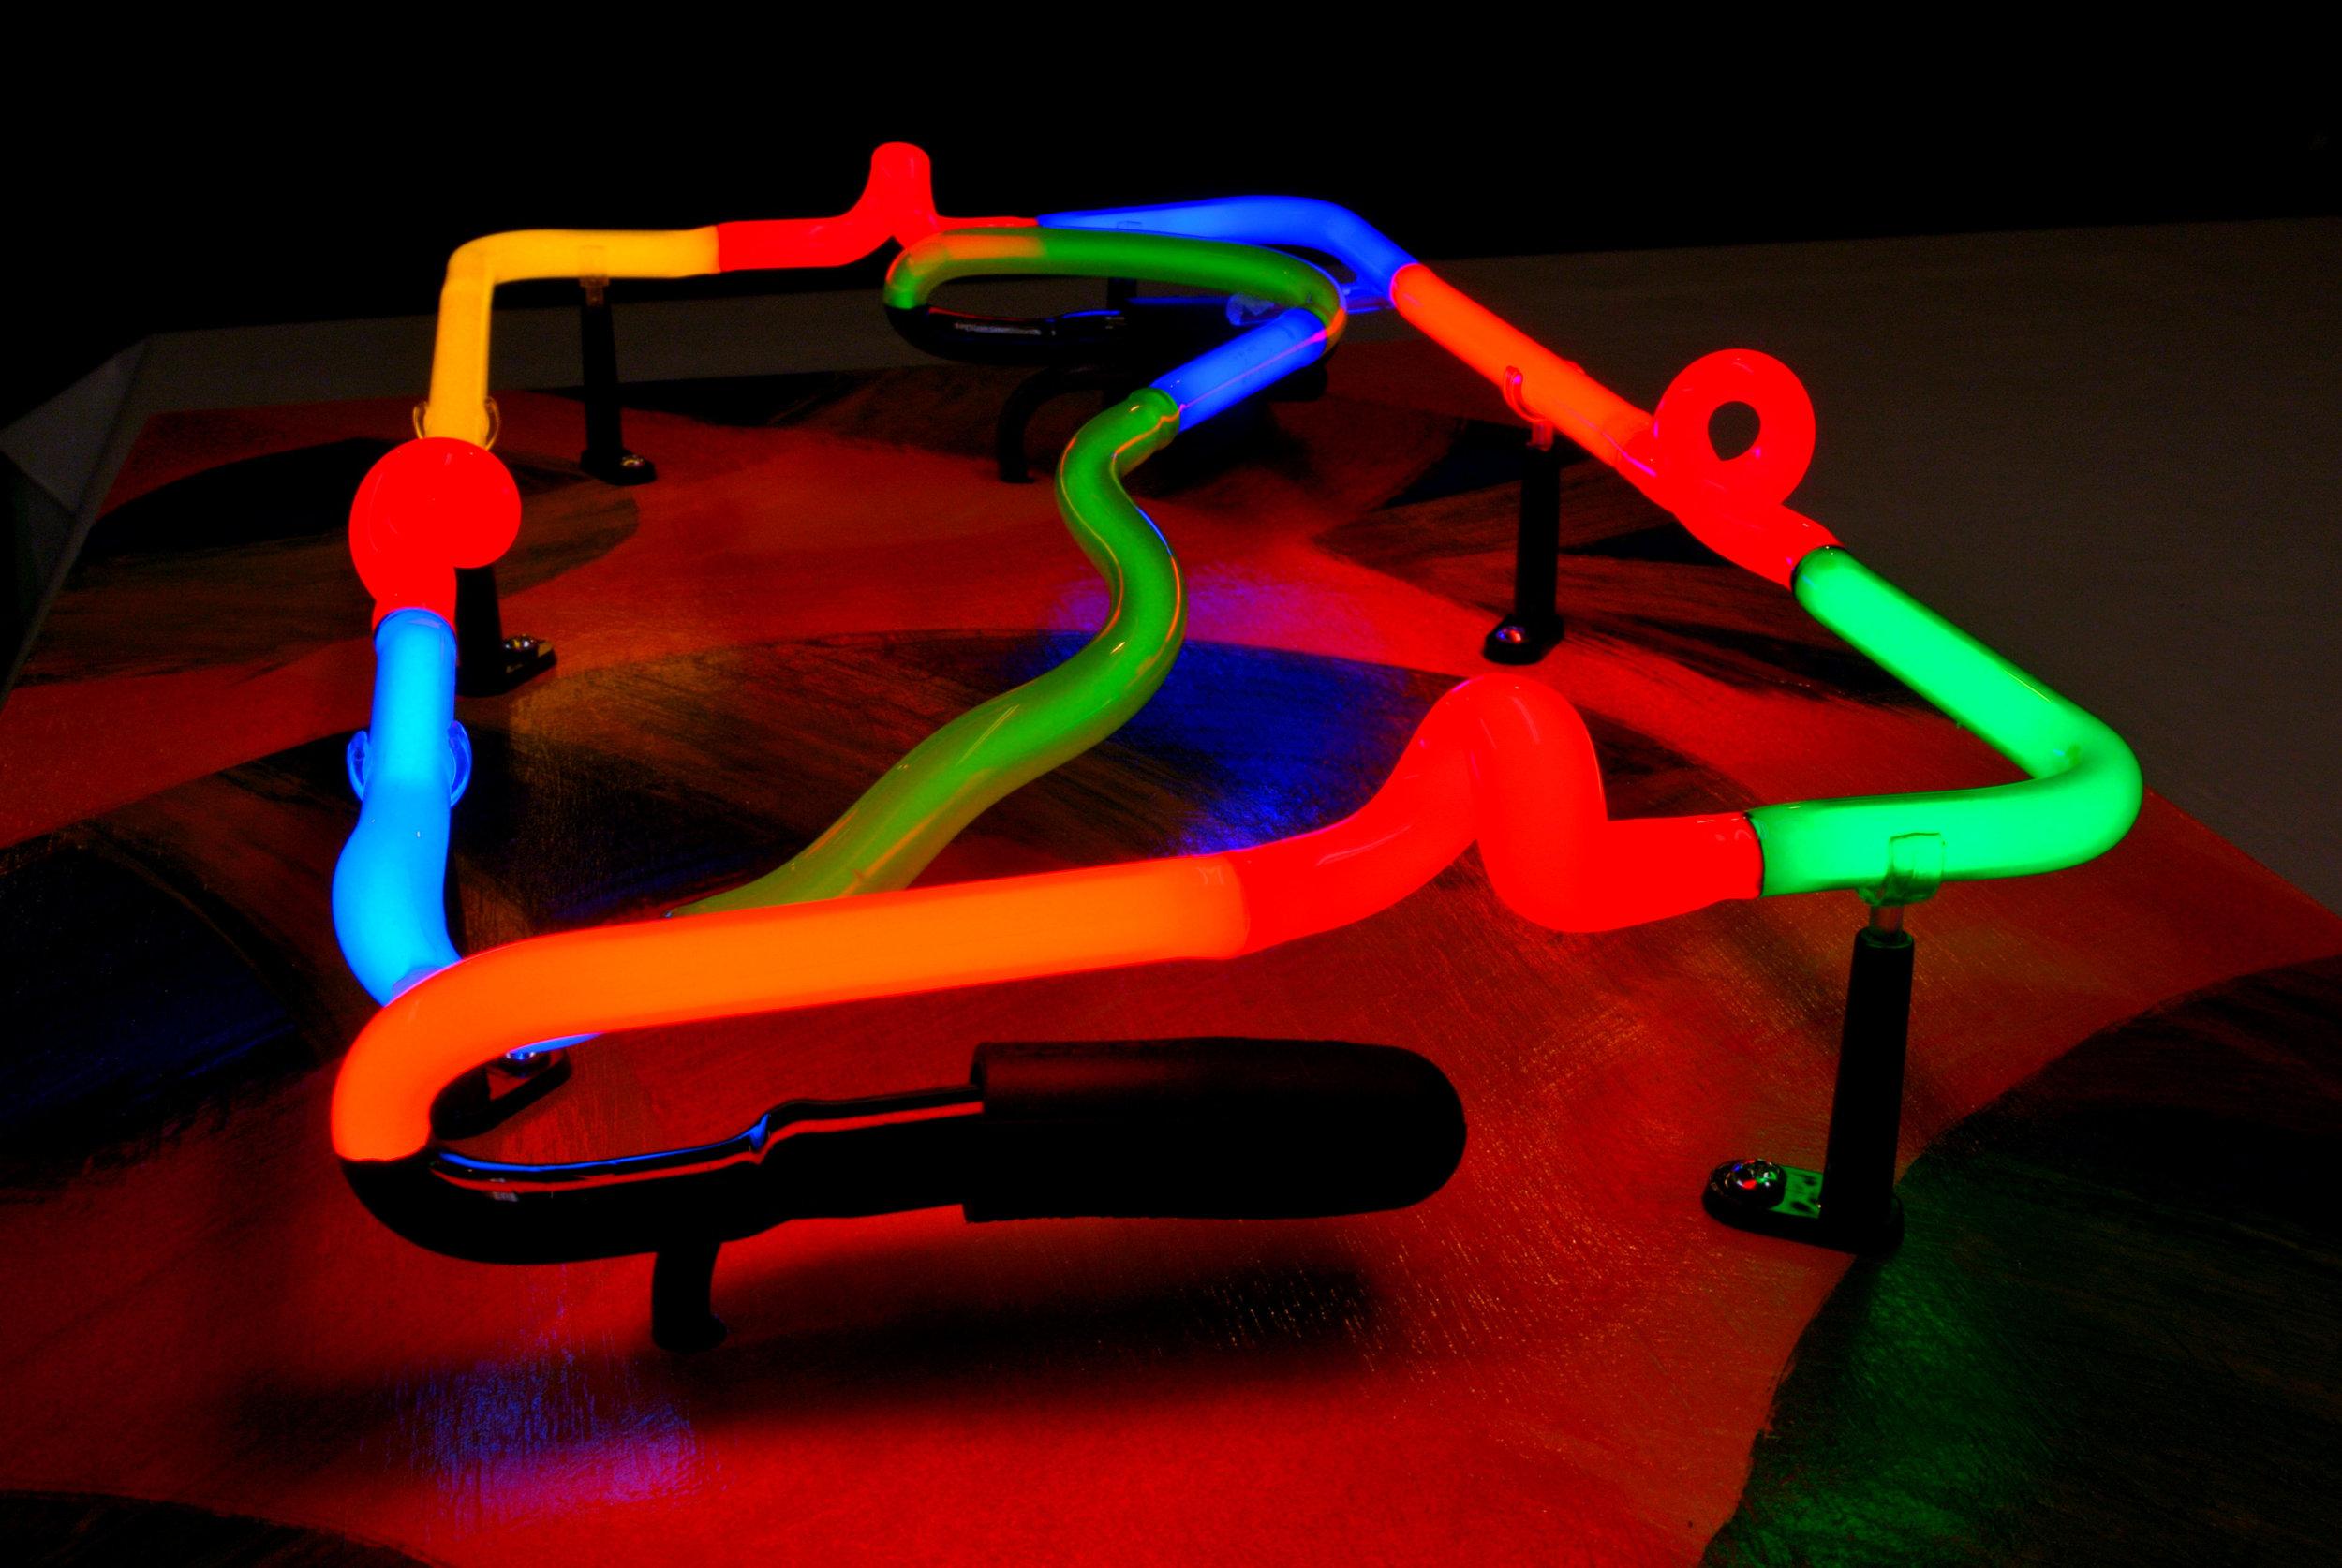 Stained Italian Glass Neon Light Sculptures by John Barton - BartonNeonMagic.com